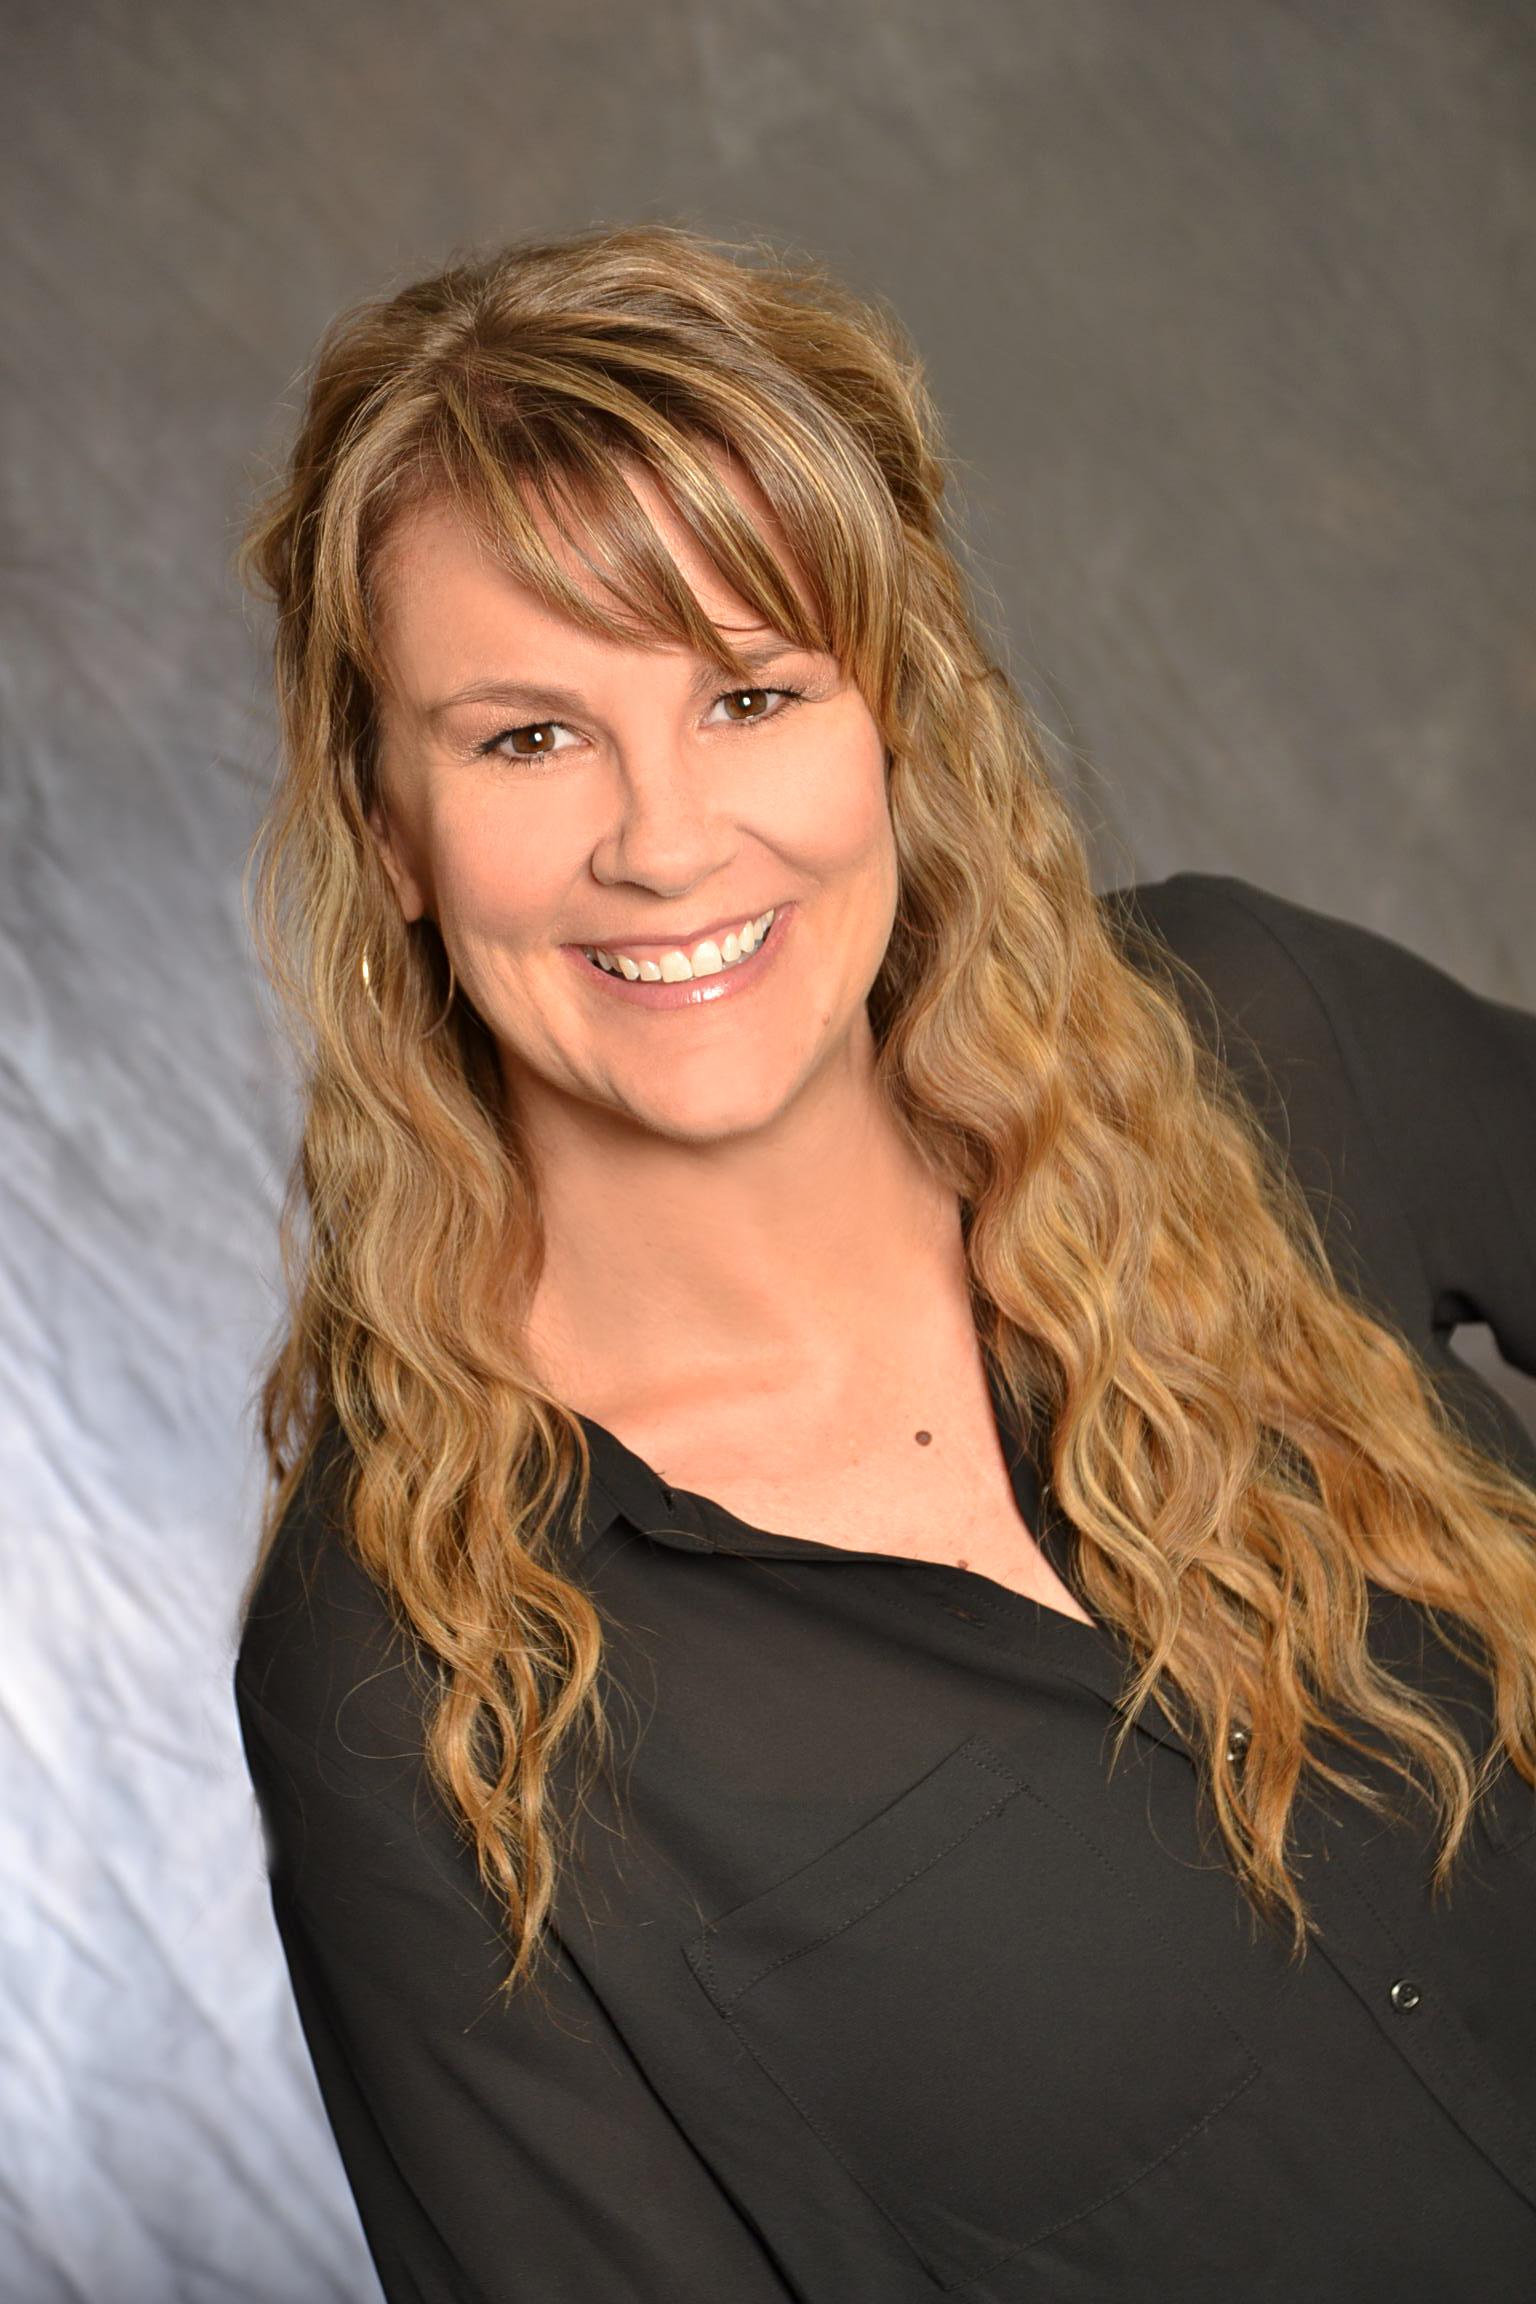 Stephanie Cosand